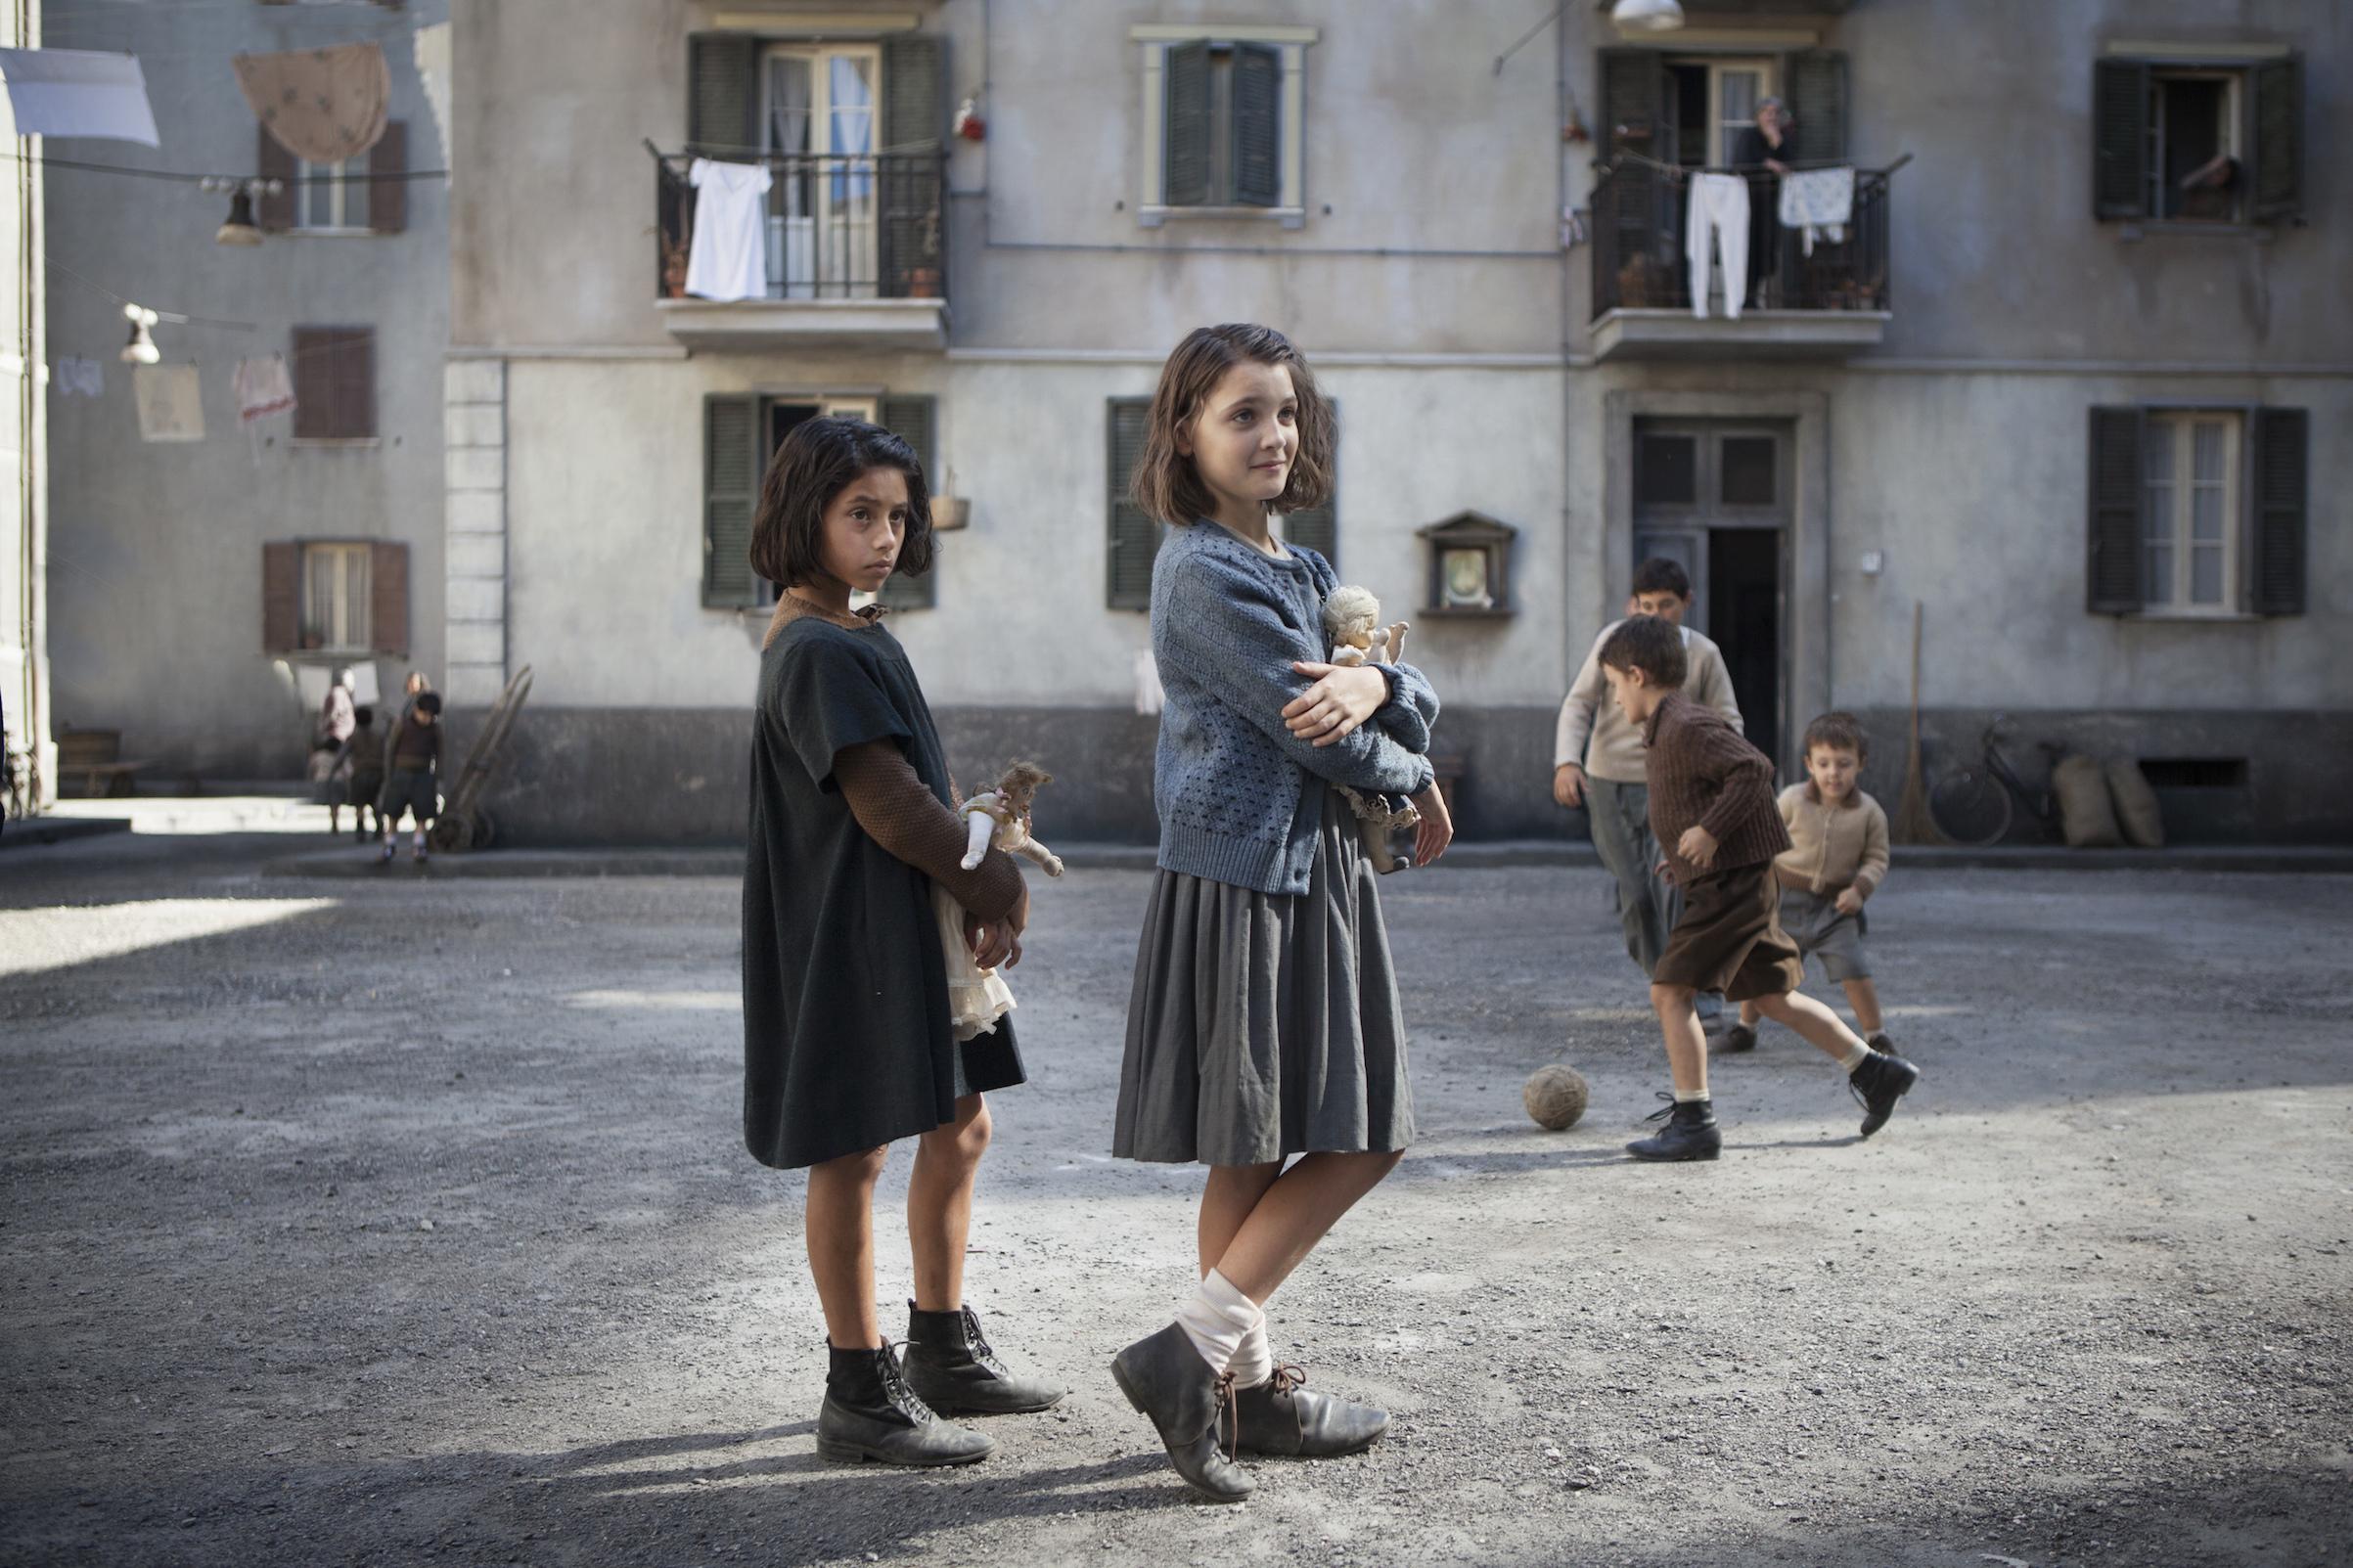 Ludovica Nasti and Elisa Del Genio in the first episode of HBO's 'My Brilliant Friend'